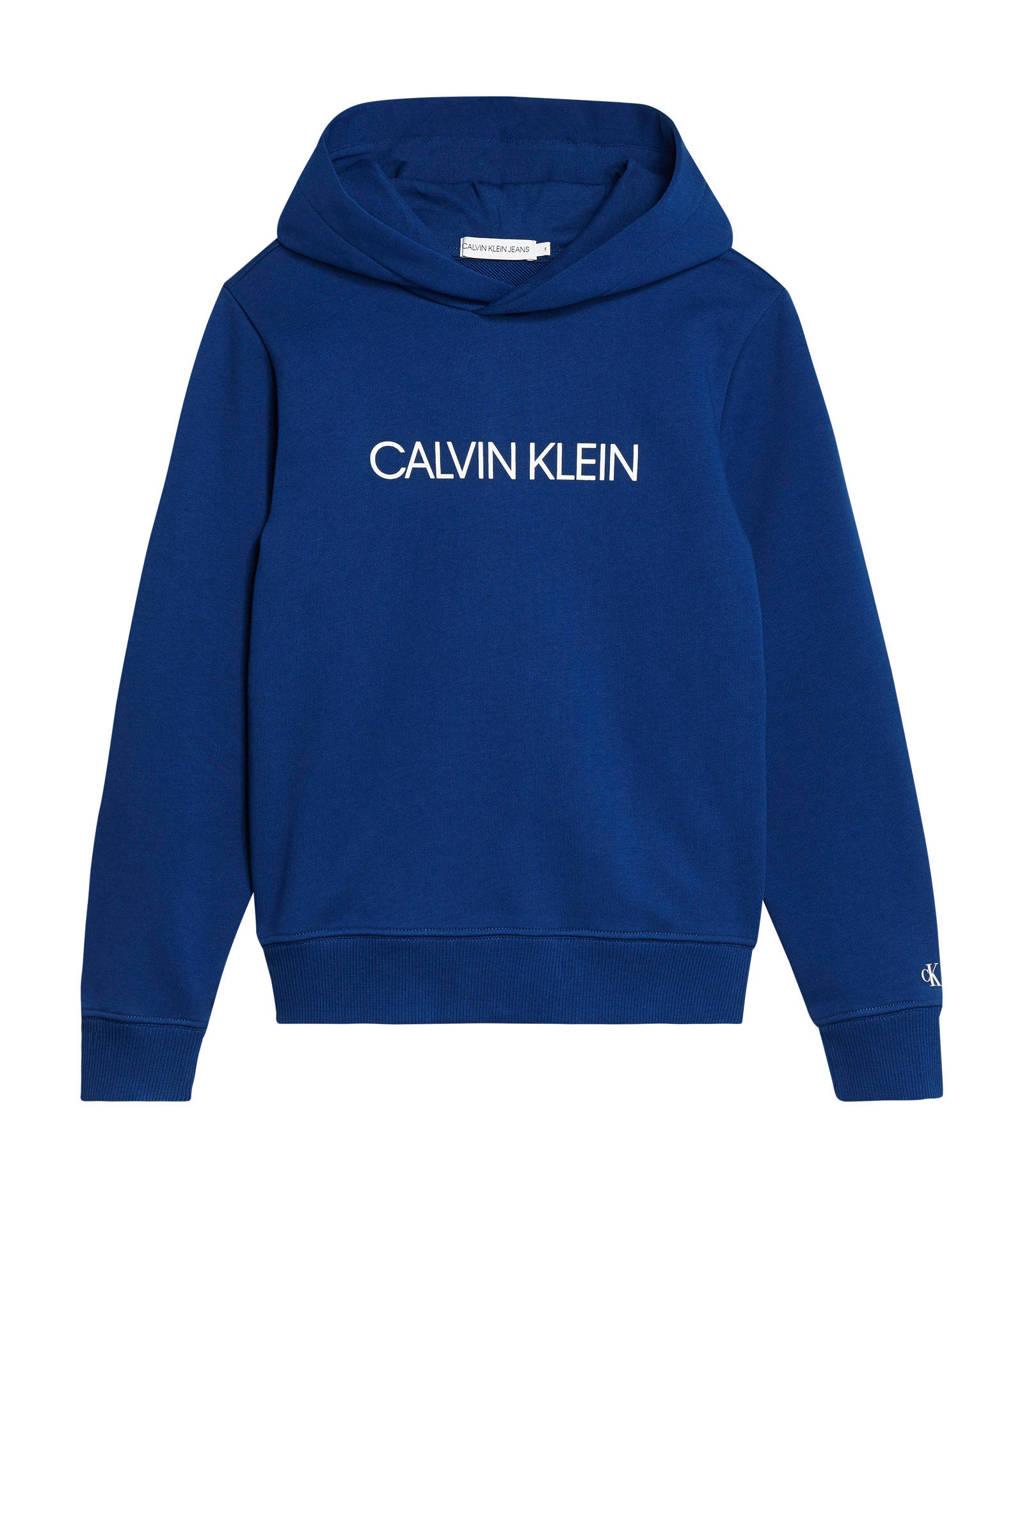 CALVIN KLEIN JEANS hoodie met logo blauw/wit, Blauw/wit